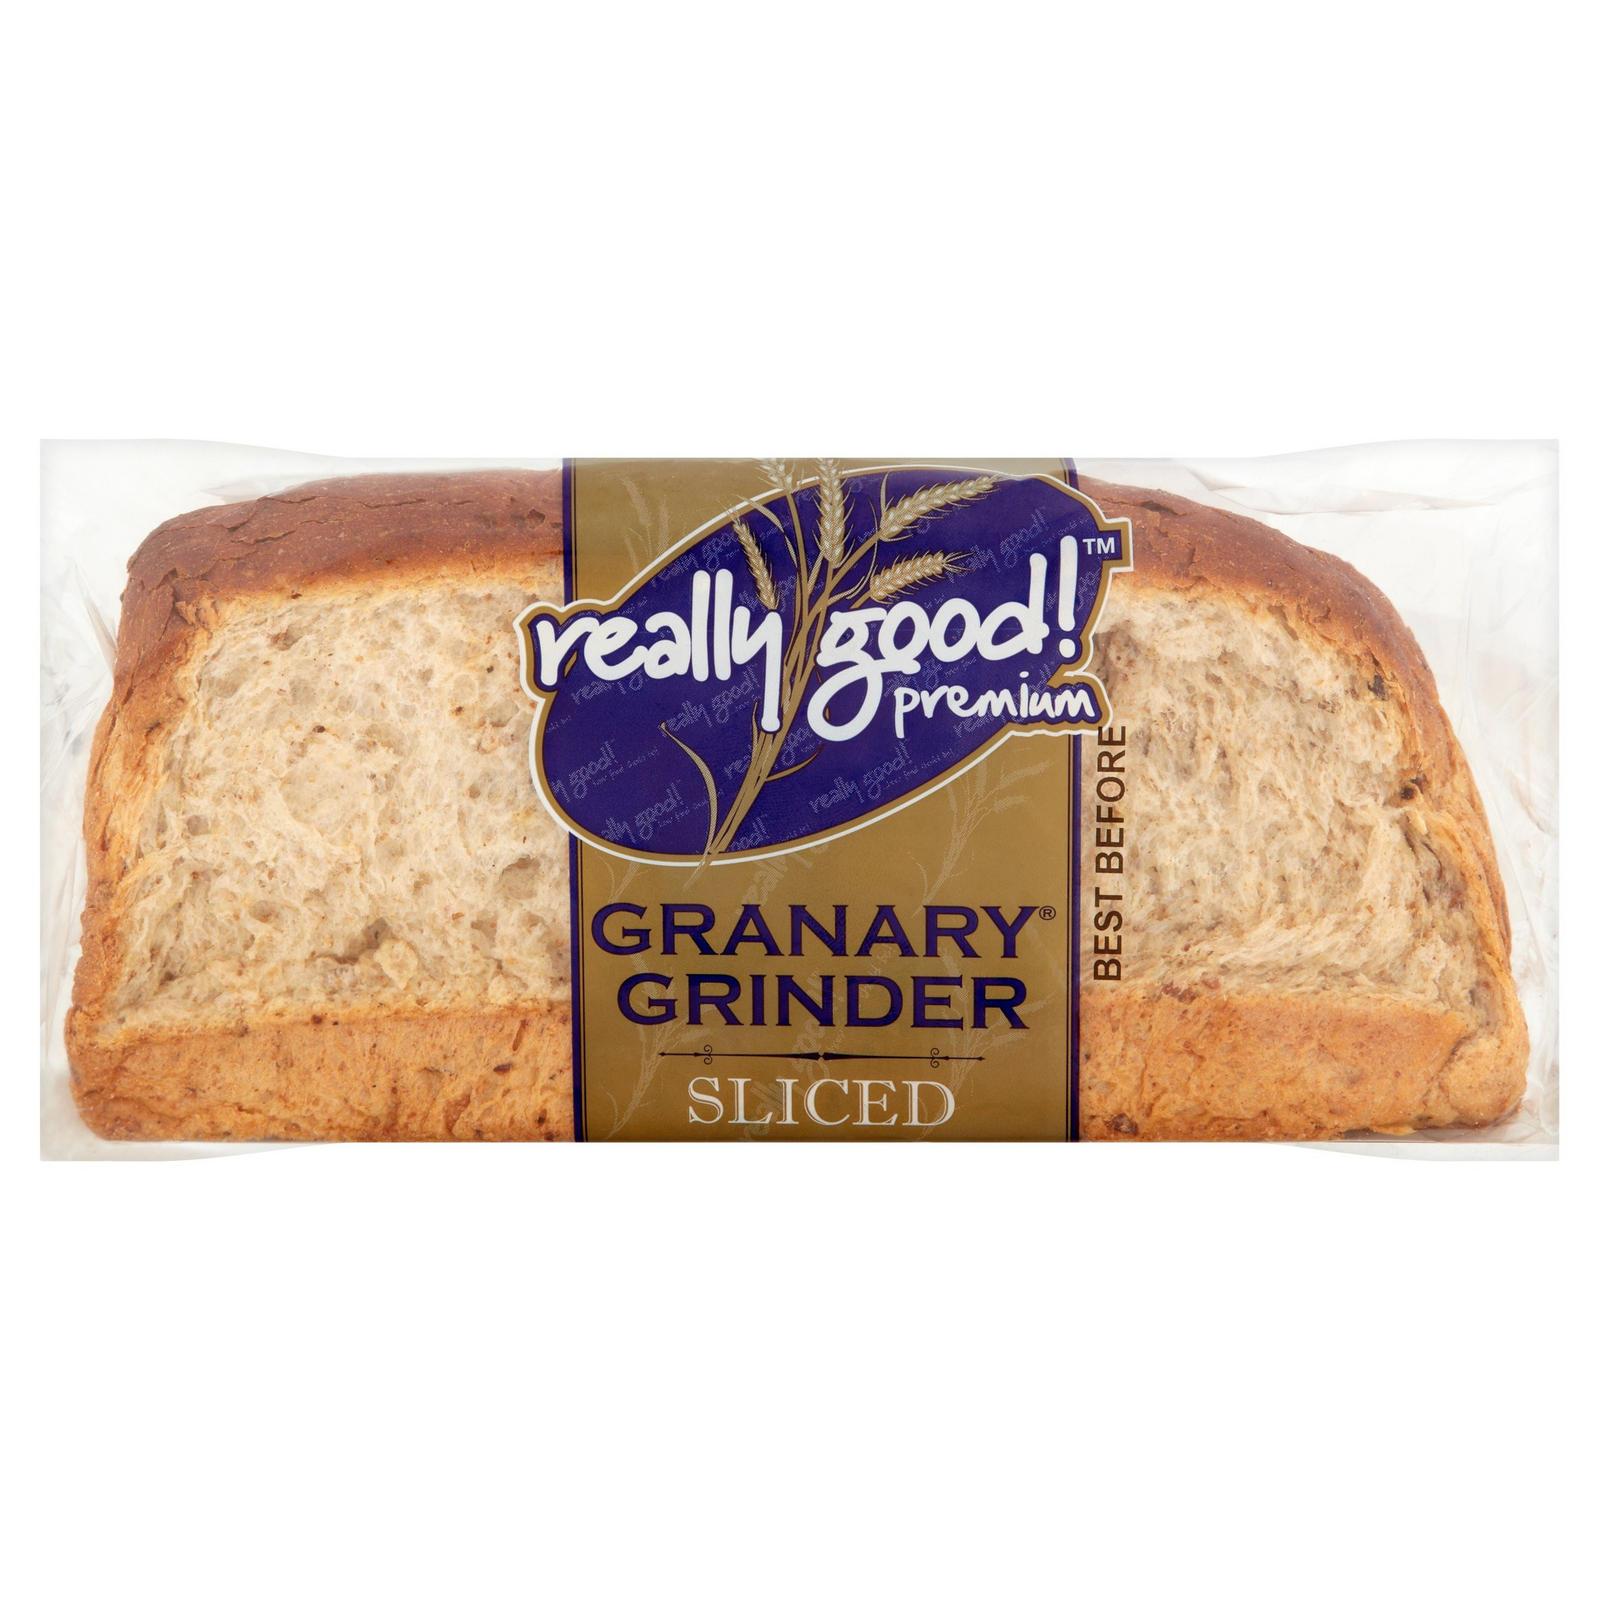 Really Good! Premium Granary Grinder Sliced 800g   Brown ...